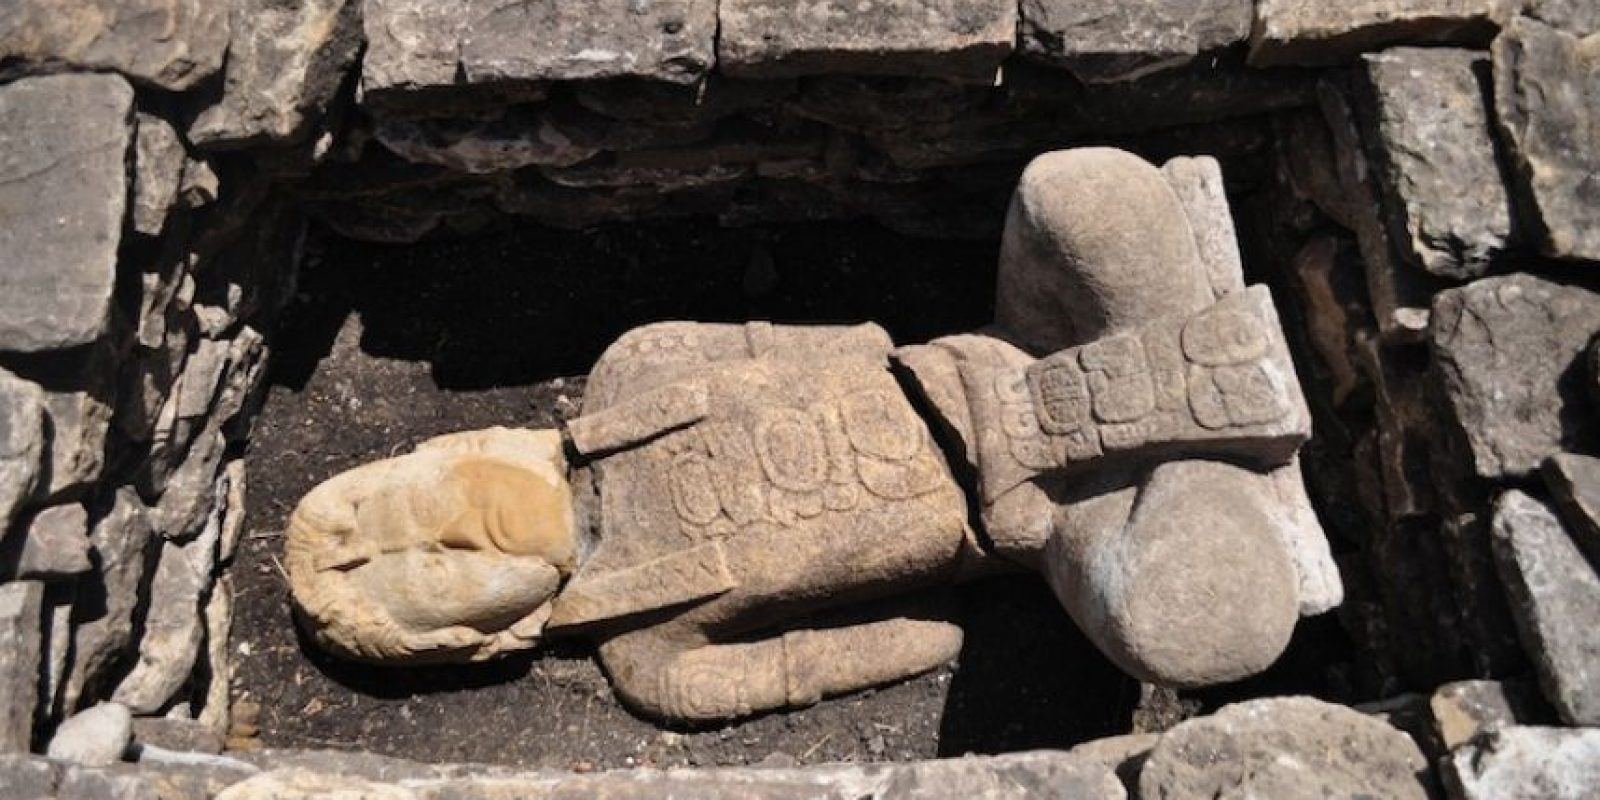 Arqueólogos del Instituto Nacional de Antropología e Historia (INAH) descubrieron en la zona arqueológica de Toniná, dos esculturas prehispánicas de piedra caliza que representan a cautivos de guerra, así como un par de tableros que fungieron como marcadores de un juego de pelota. Foto:Cuartoscuro